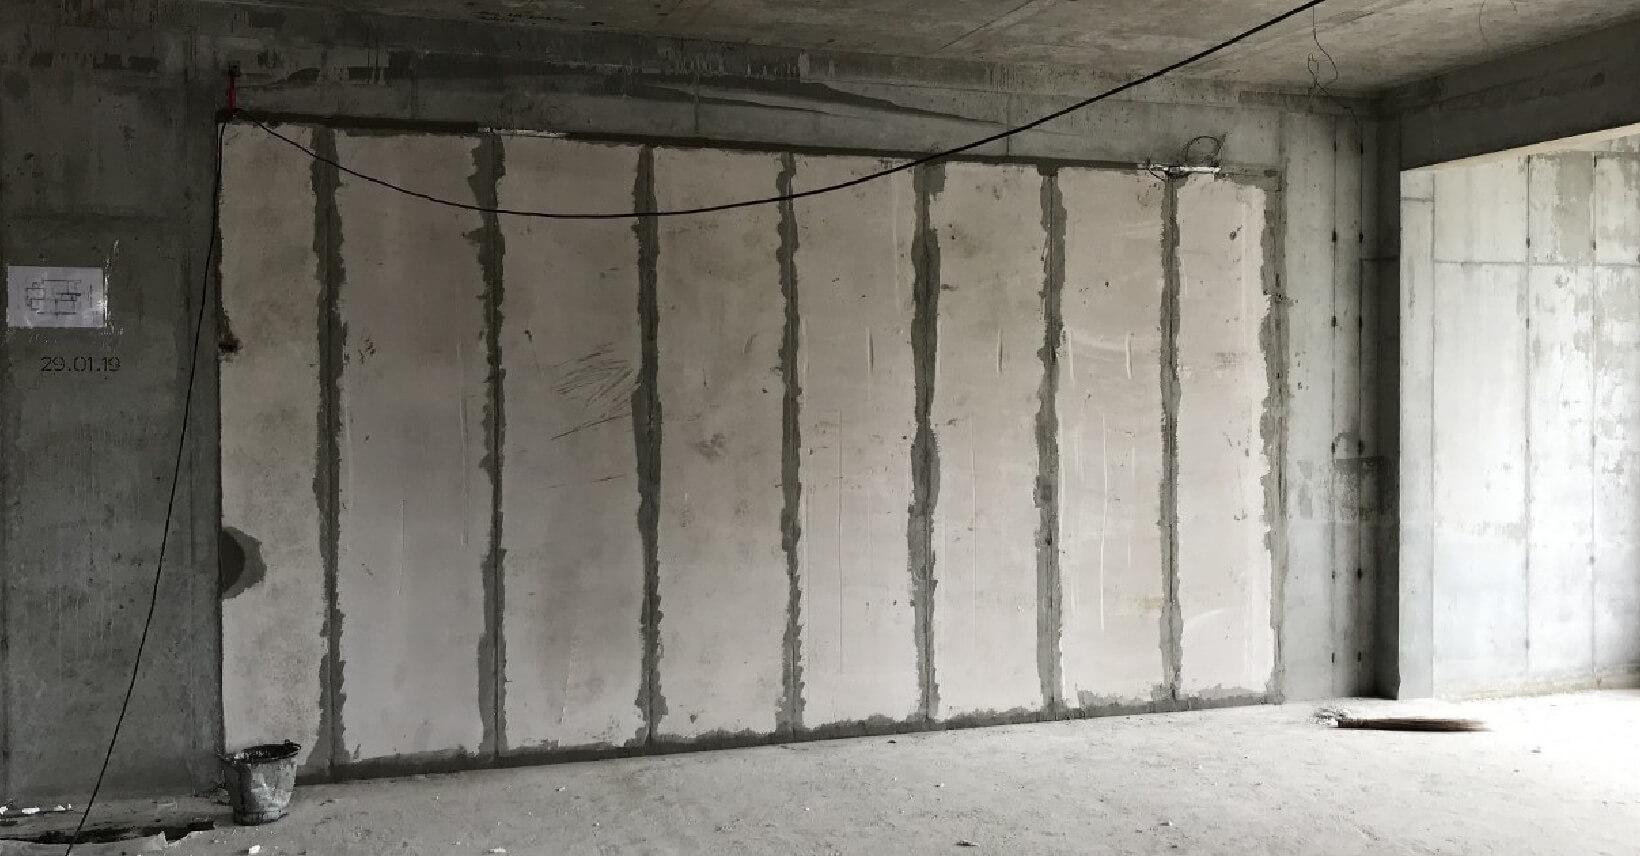 no crack wall reference site - Zmartbuild Wall Panel